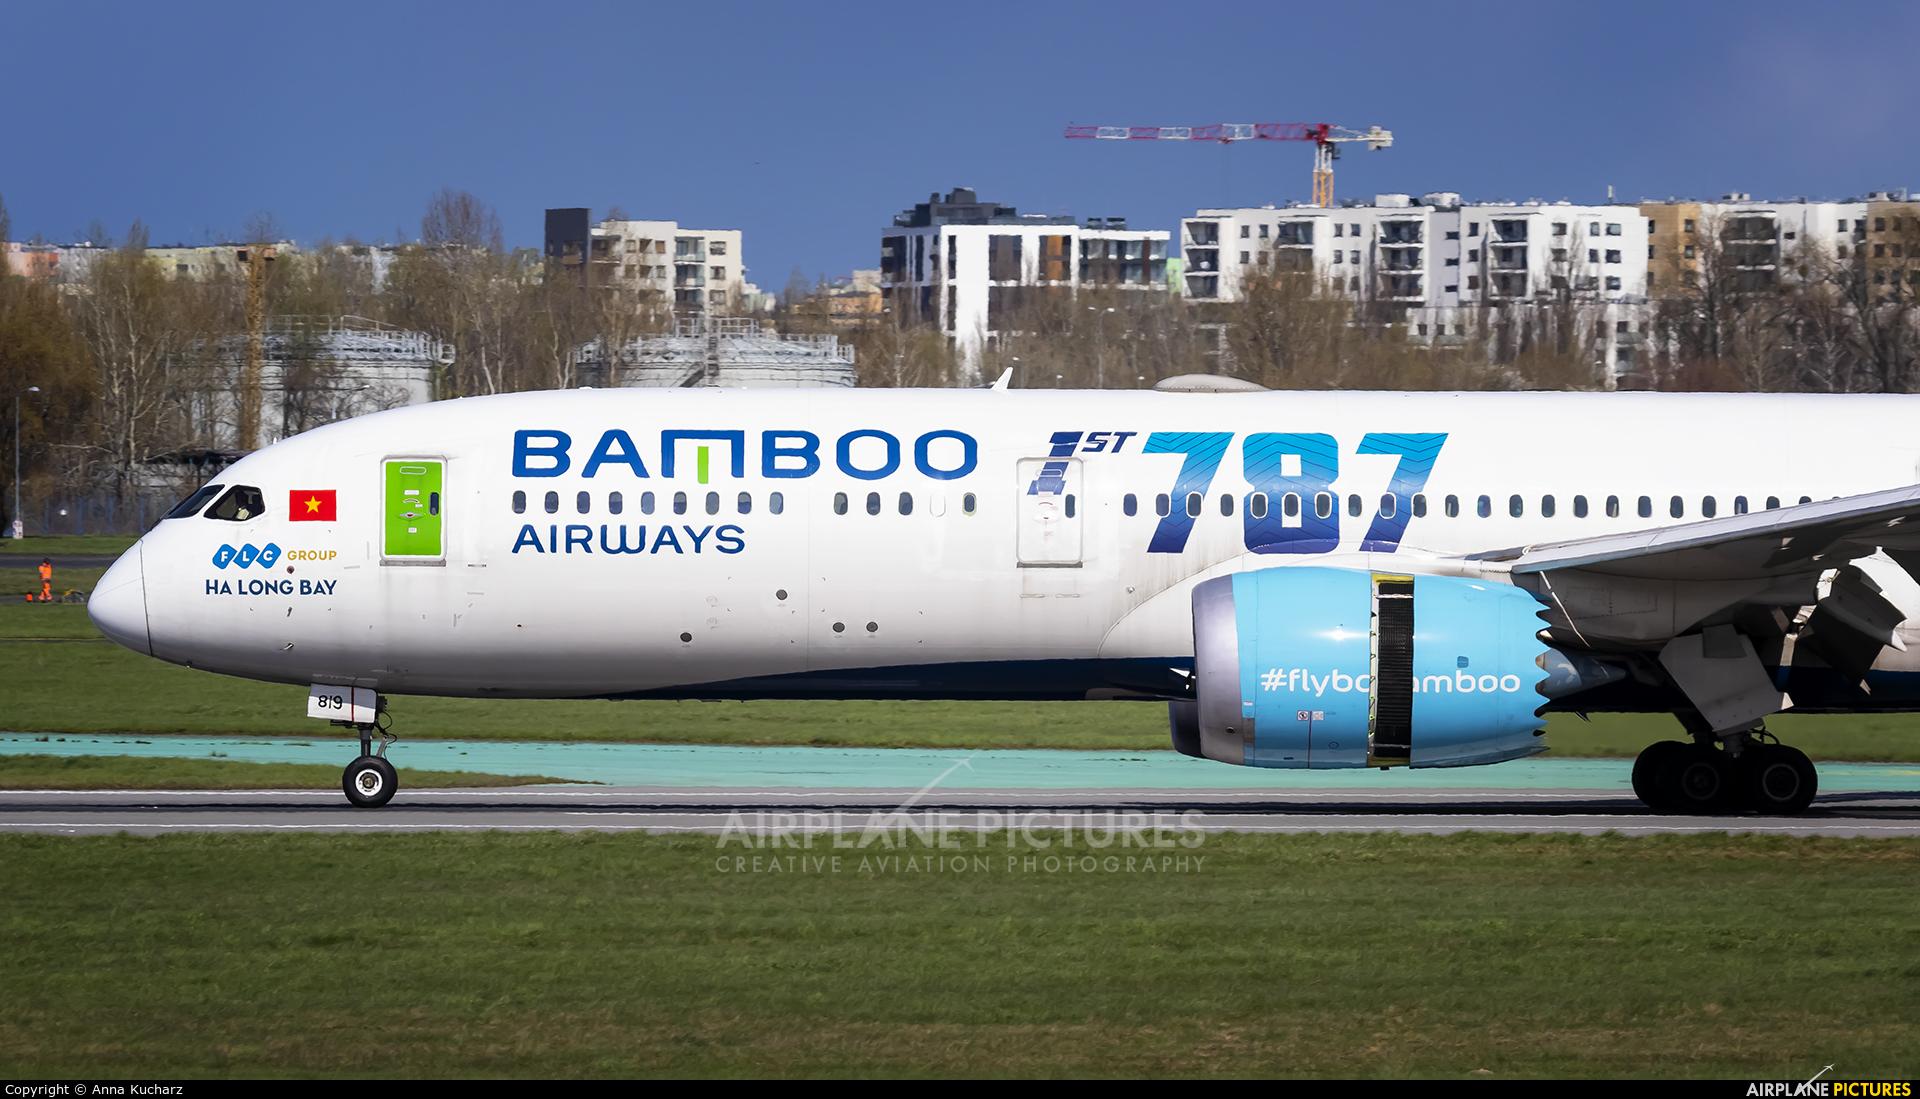 Bamboo Airways VN-A819 aircraft at Warsaw - Frederic Chopin